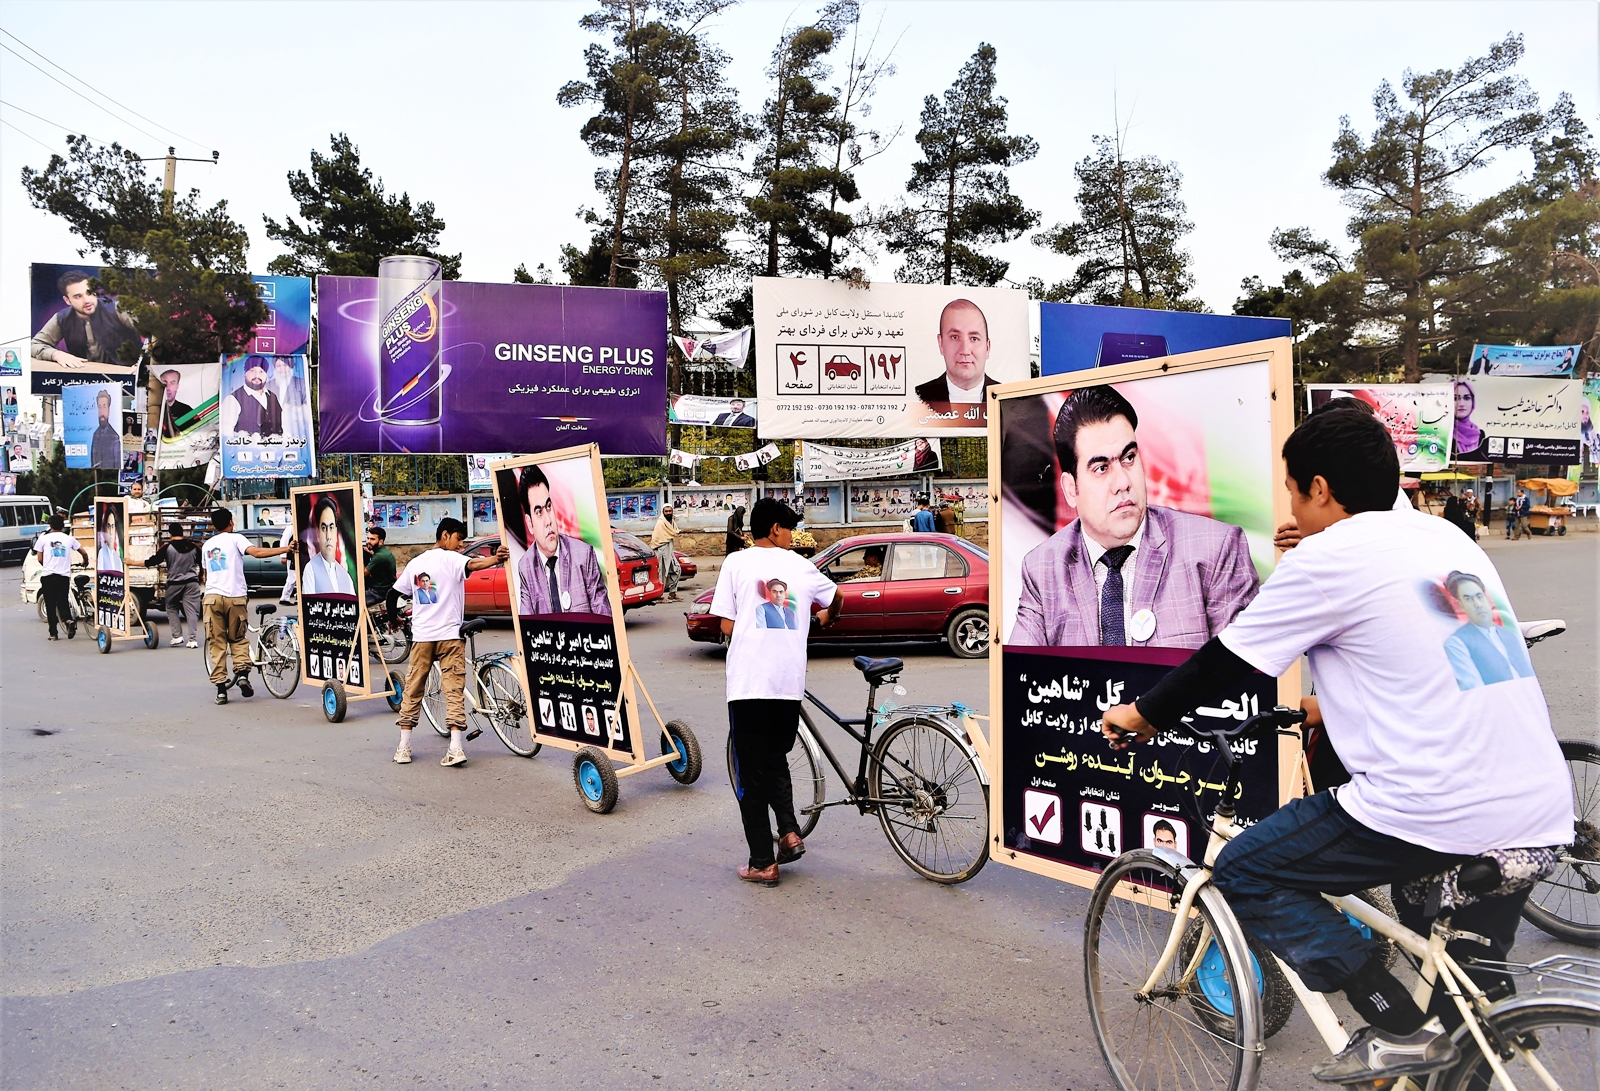 L'Afghanistan sabato al voto, già 10 candidati uccisi. Ultima vittima Abdul Jabar Qahraman